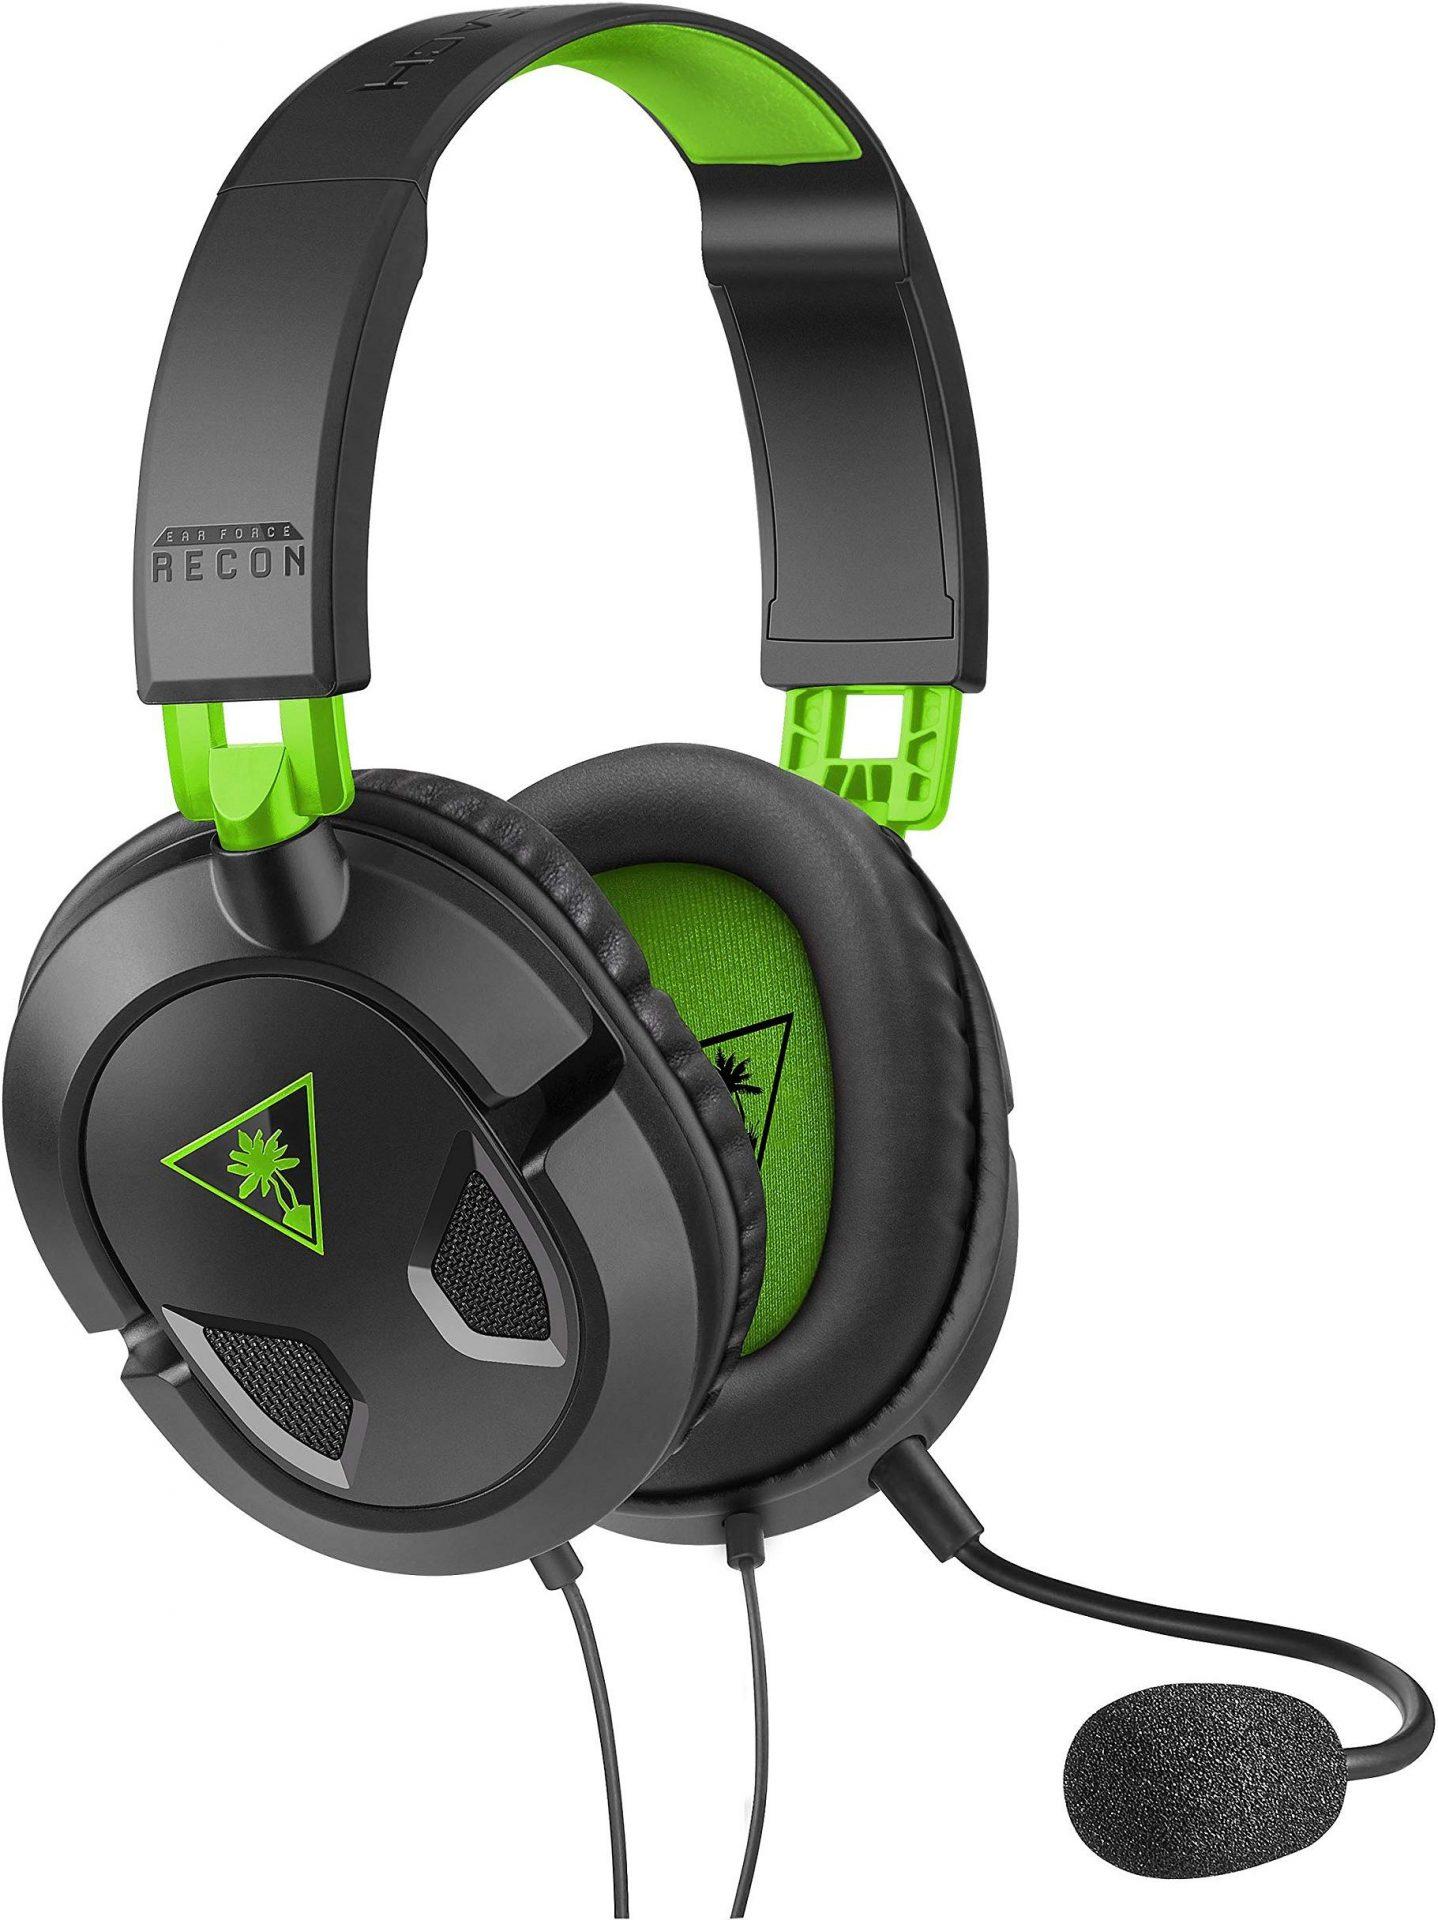 Best Gaming Headphones - UltimateGameChair